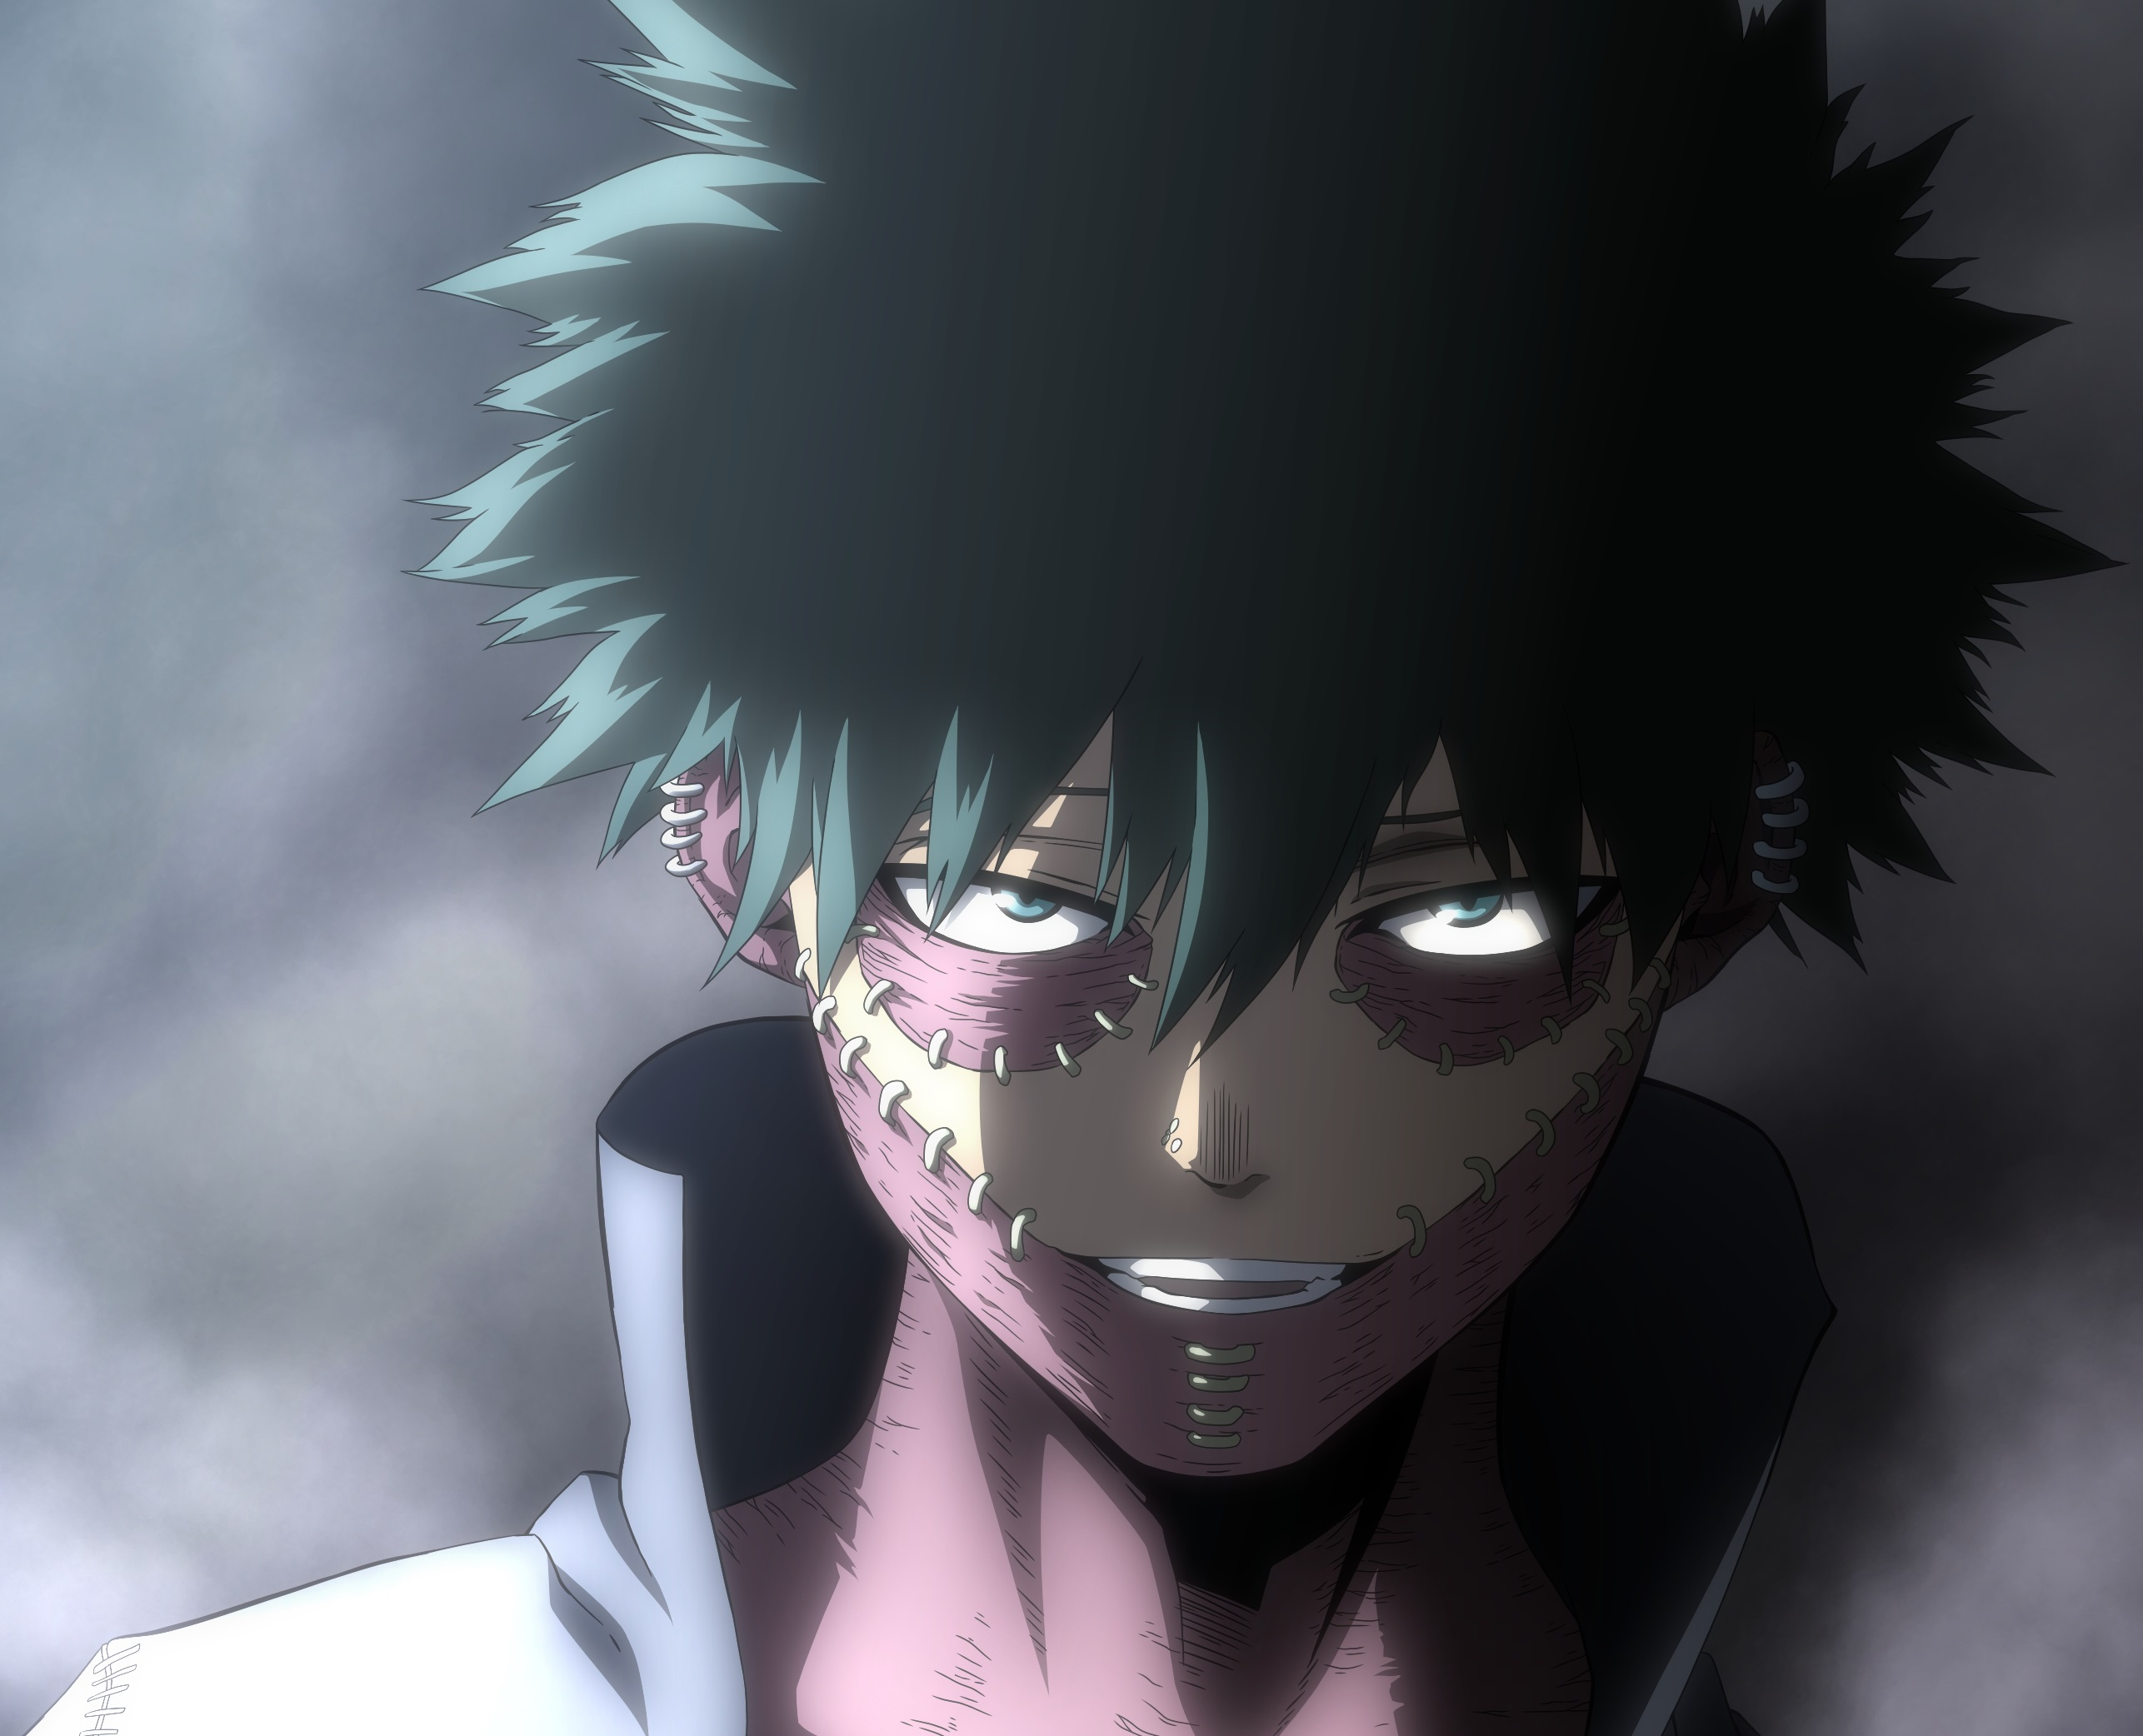 Anime Anime Boys Dabi Boku No Hero Academia Wallpaper Resolution 2572x2084 Id 578003 Wallha Com